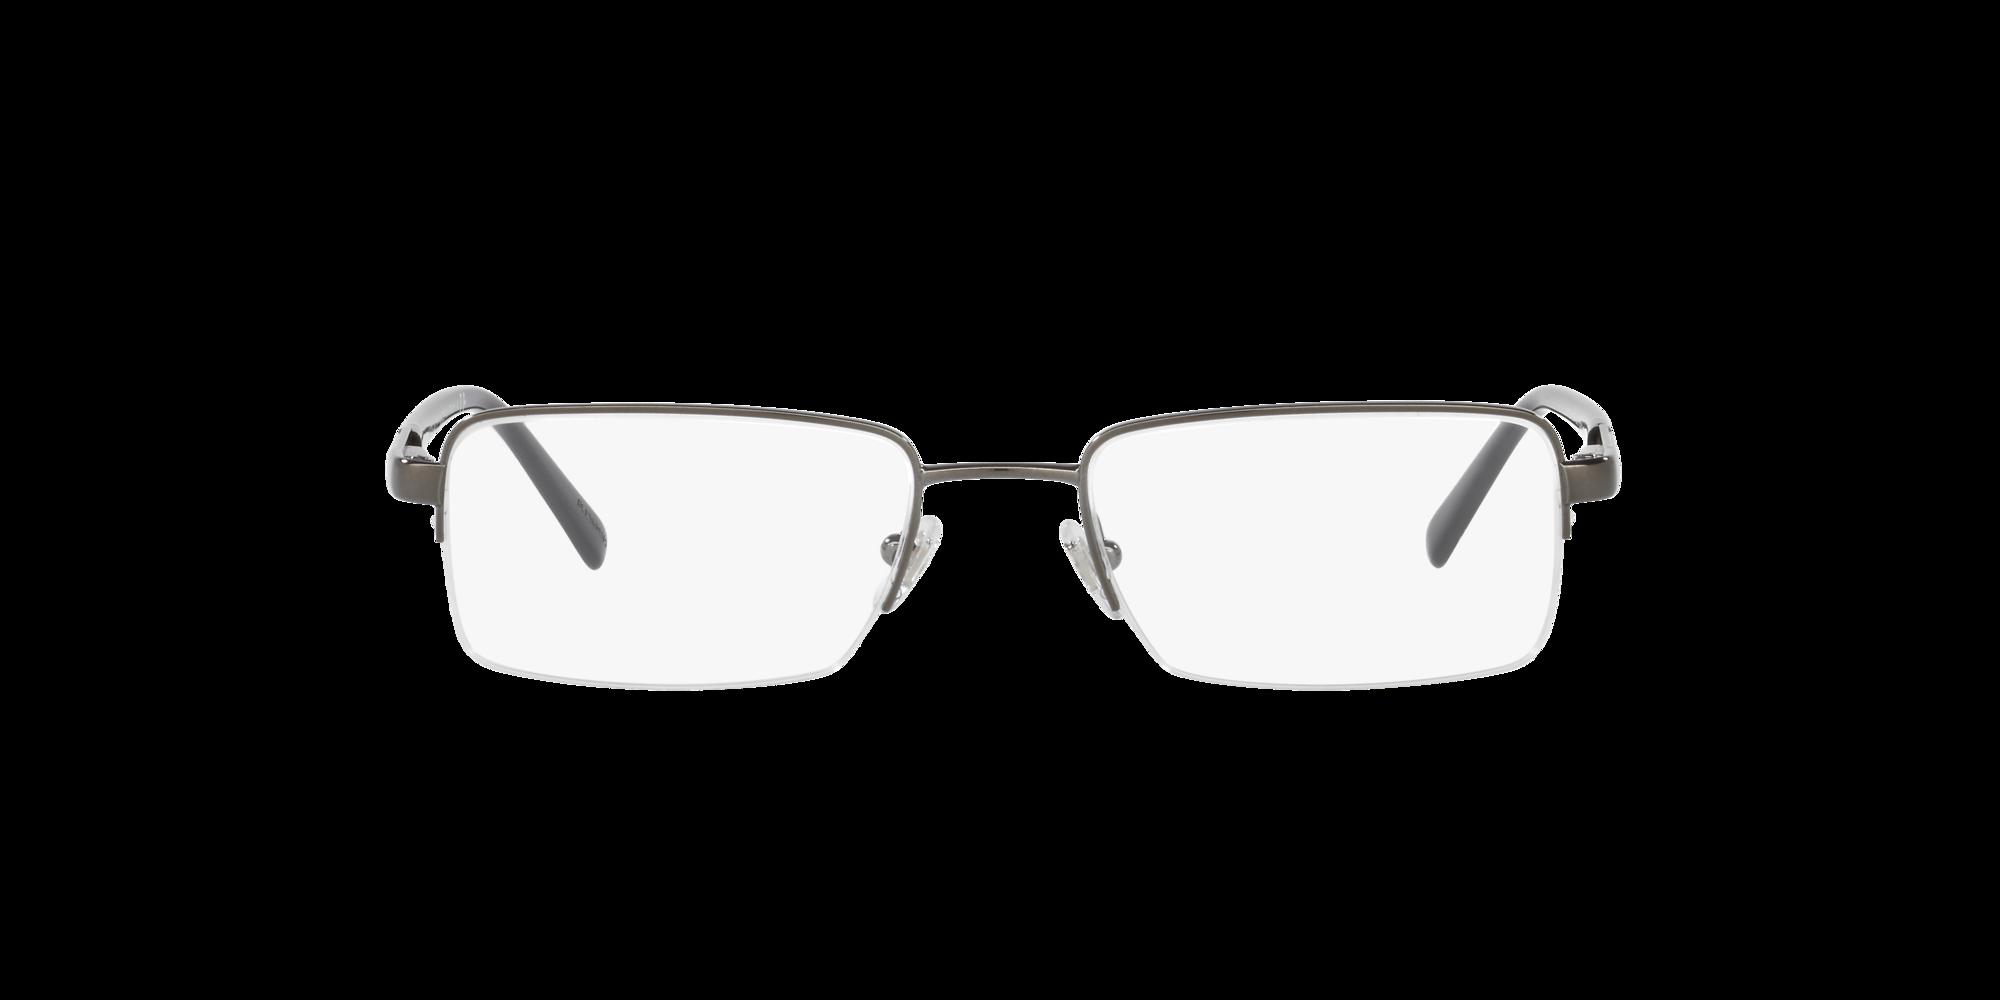 Image for VE1066 from LensCrafters   Glasses, Prescription Glasses Online, Eyewear